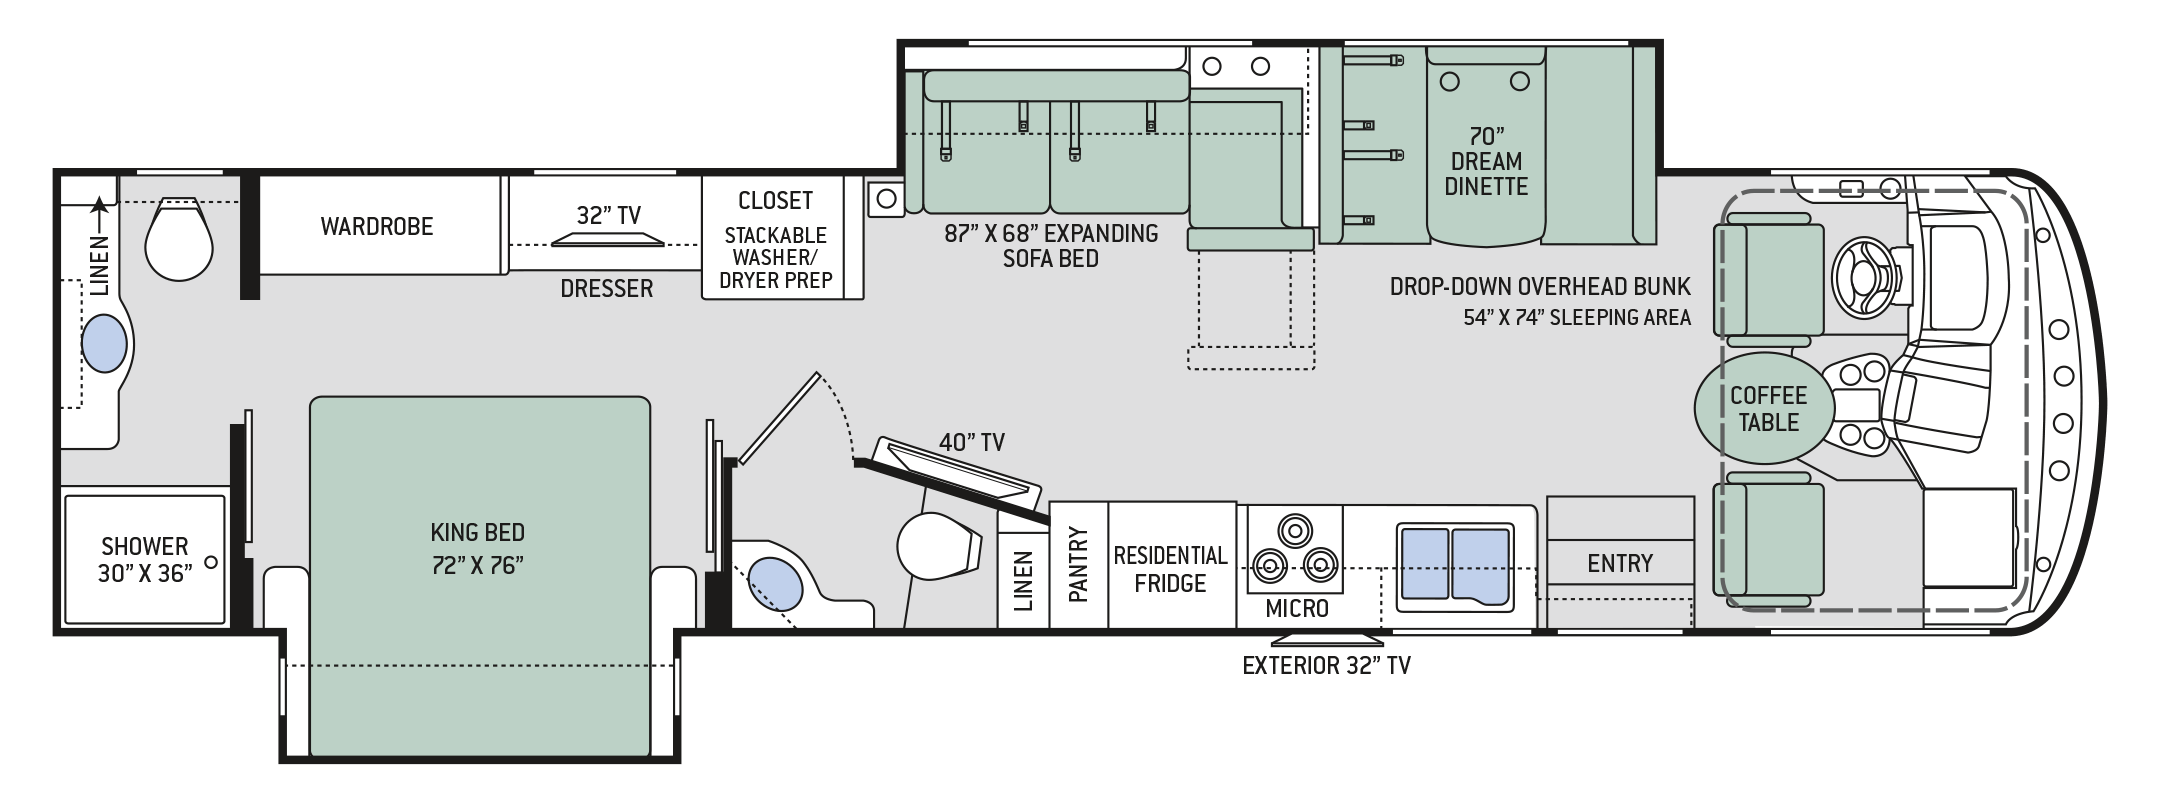 Floor Plans Hurricane 35m Floor Plans Camping World Rv Sales Motorhomes For Sale